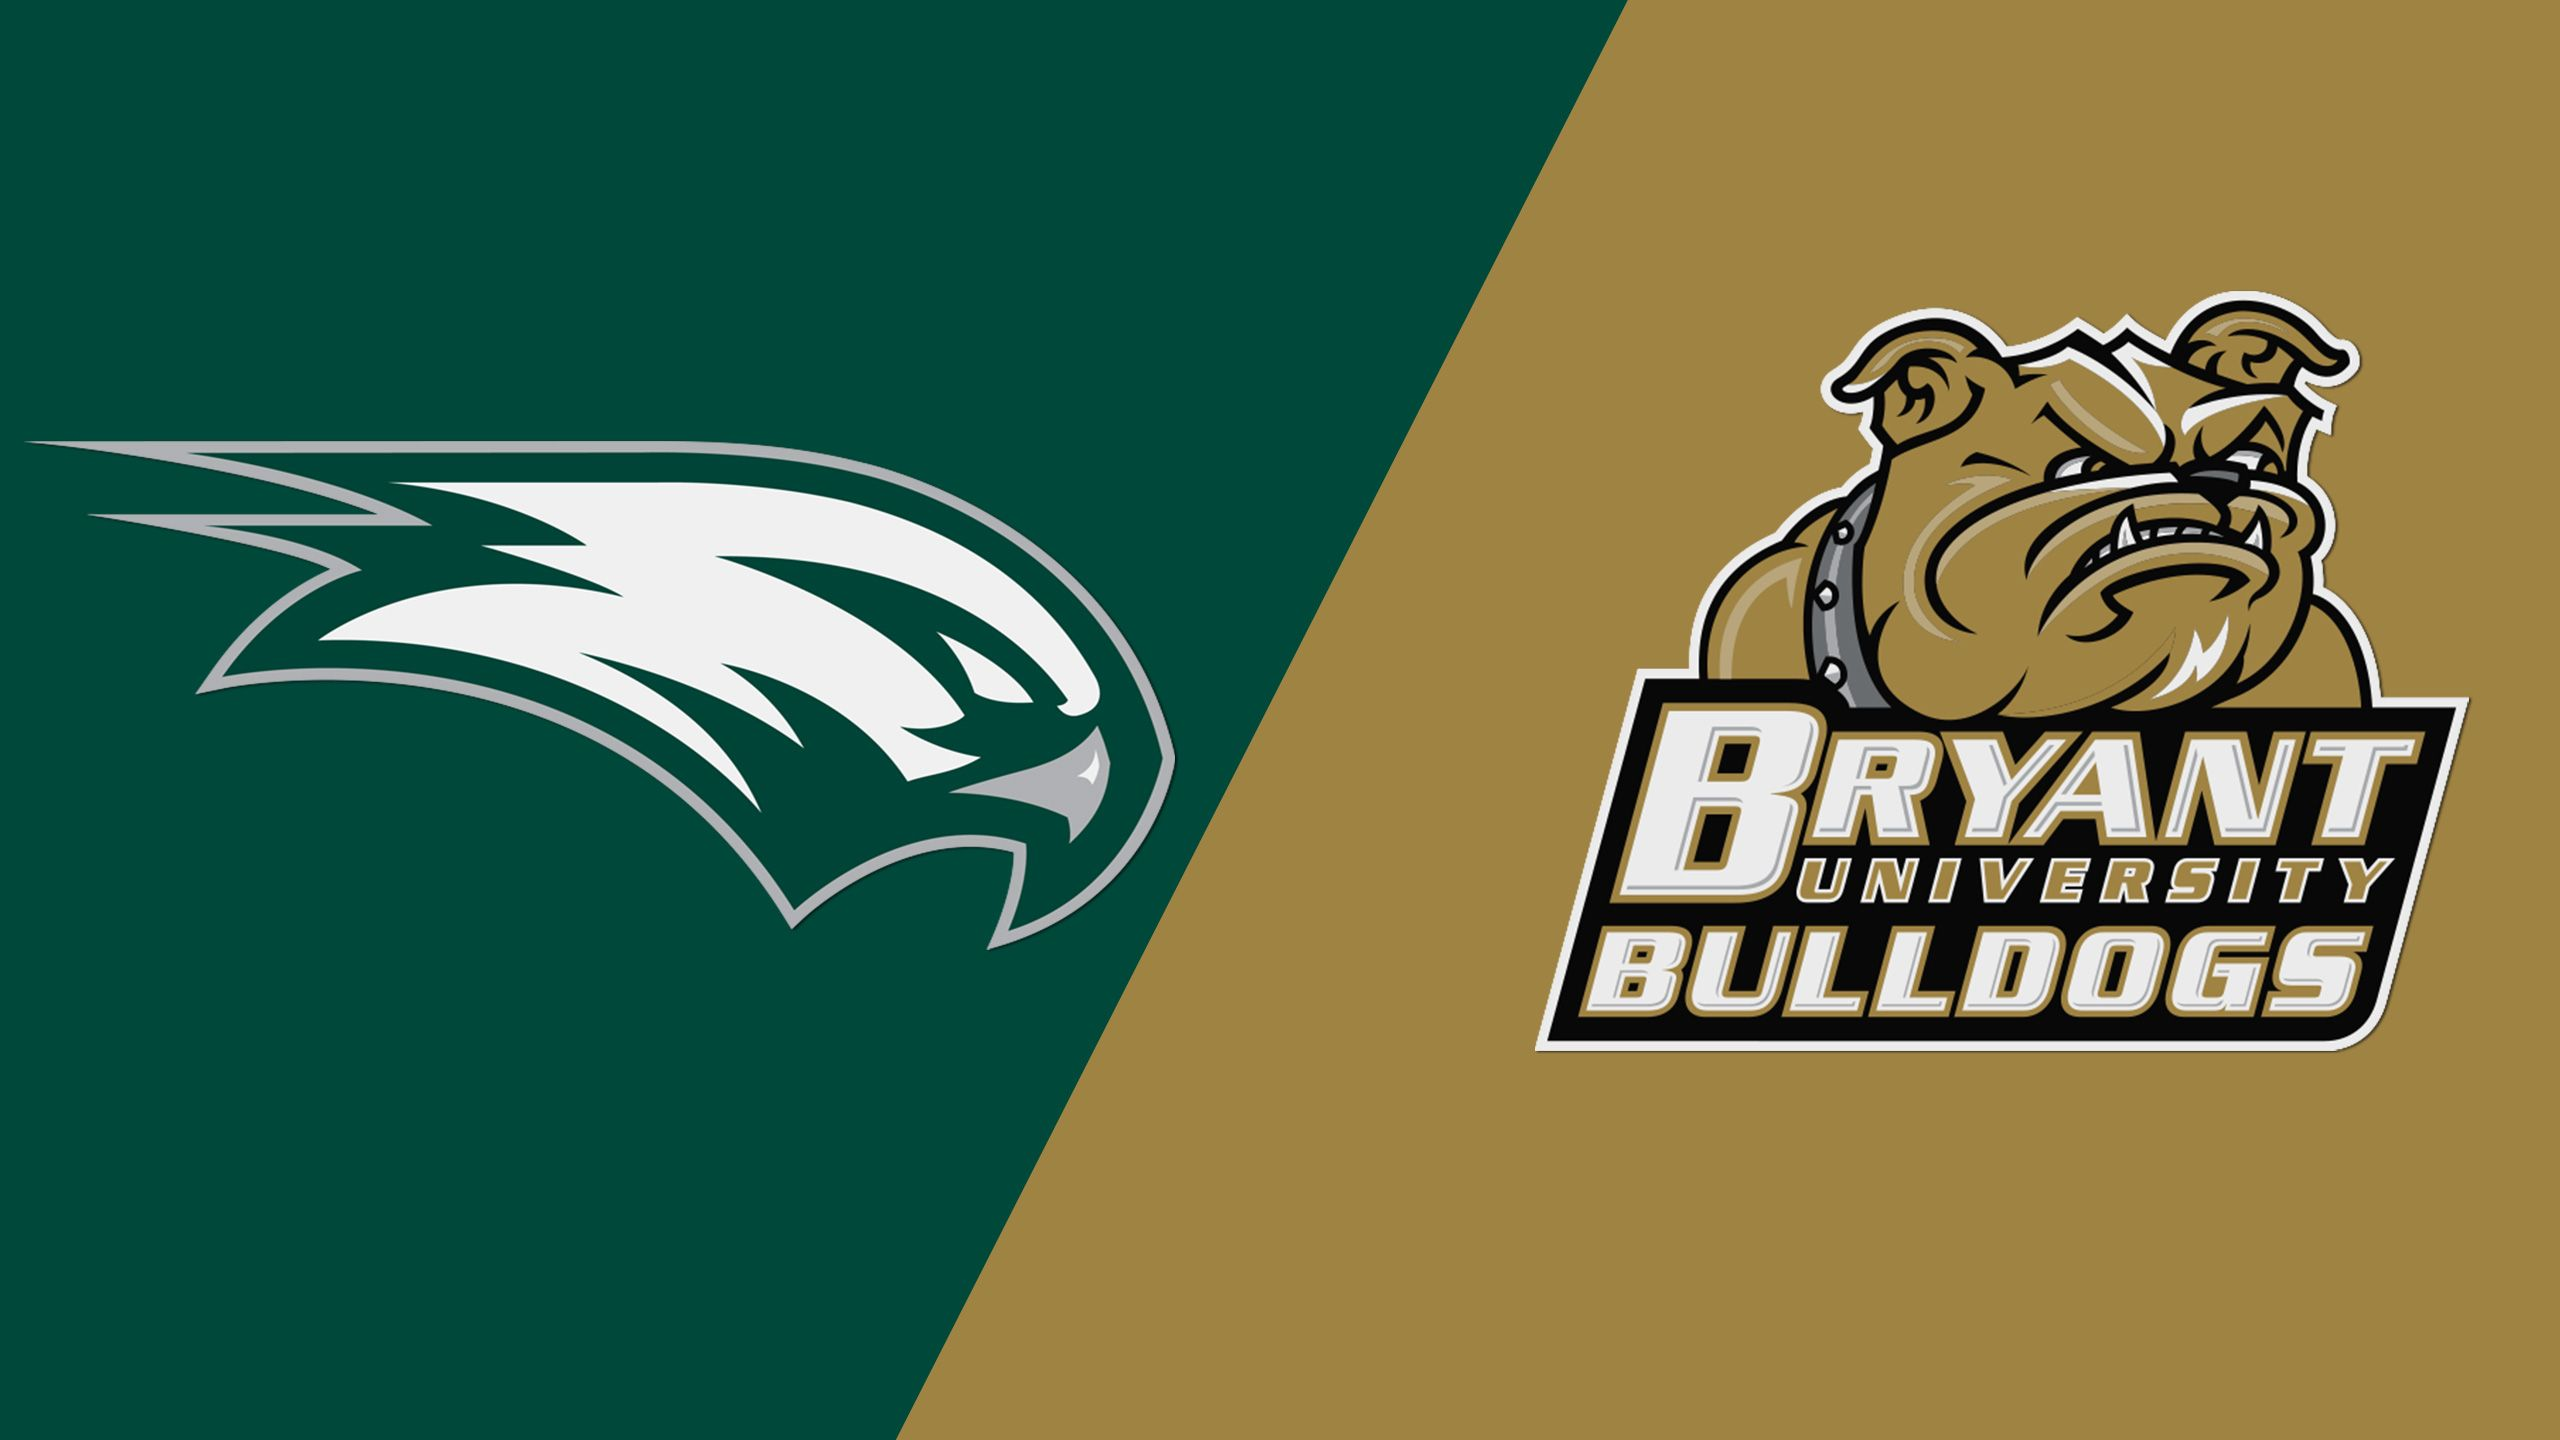 Wagner vs. Bryant (Championship) (NEC Women's Lacrosse Championship)